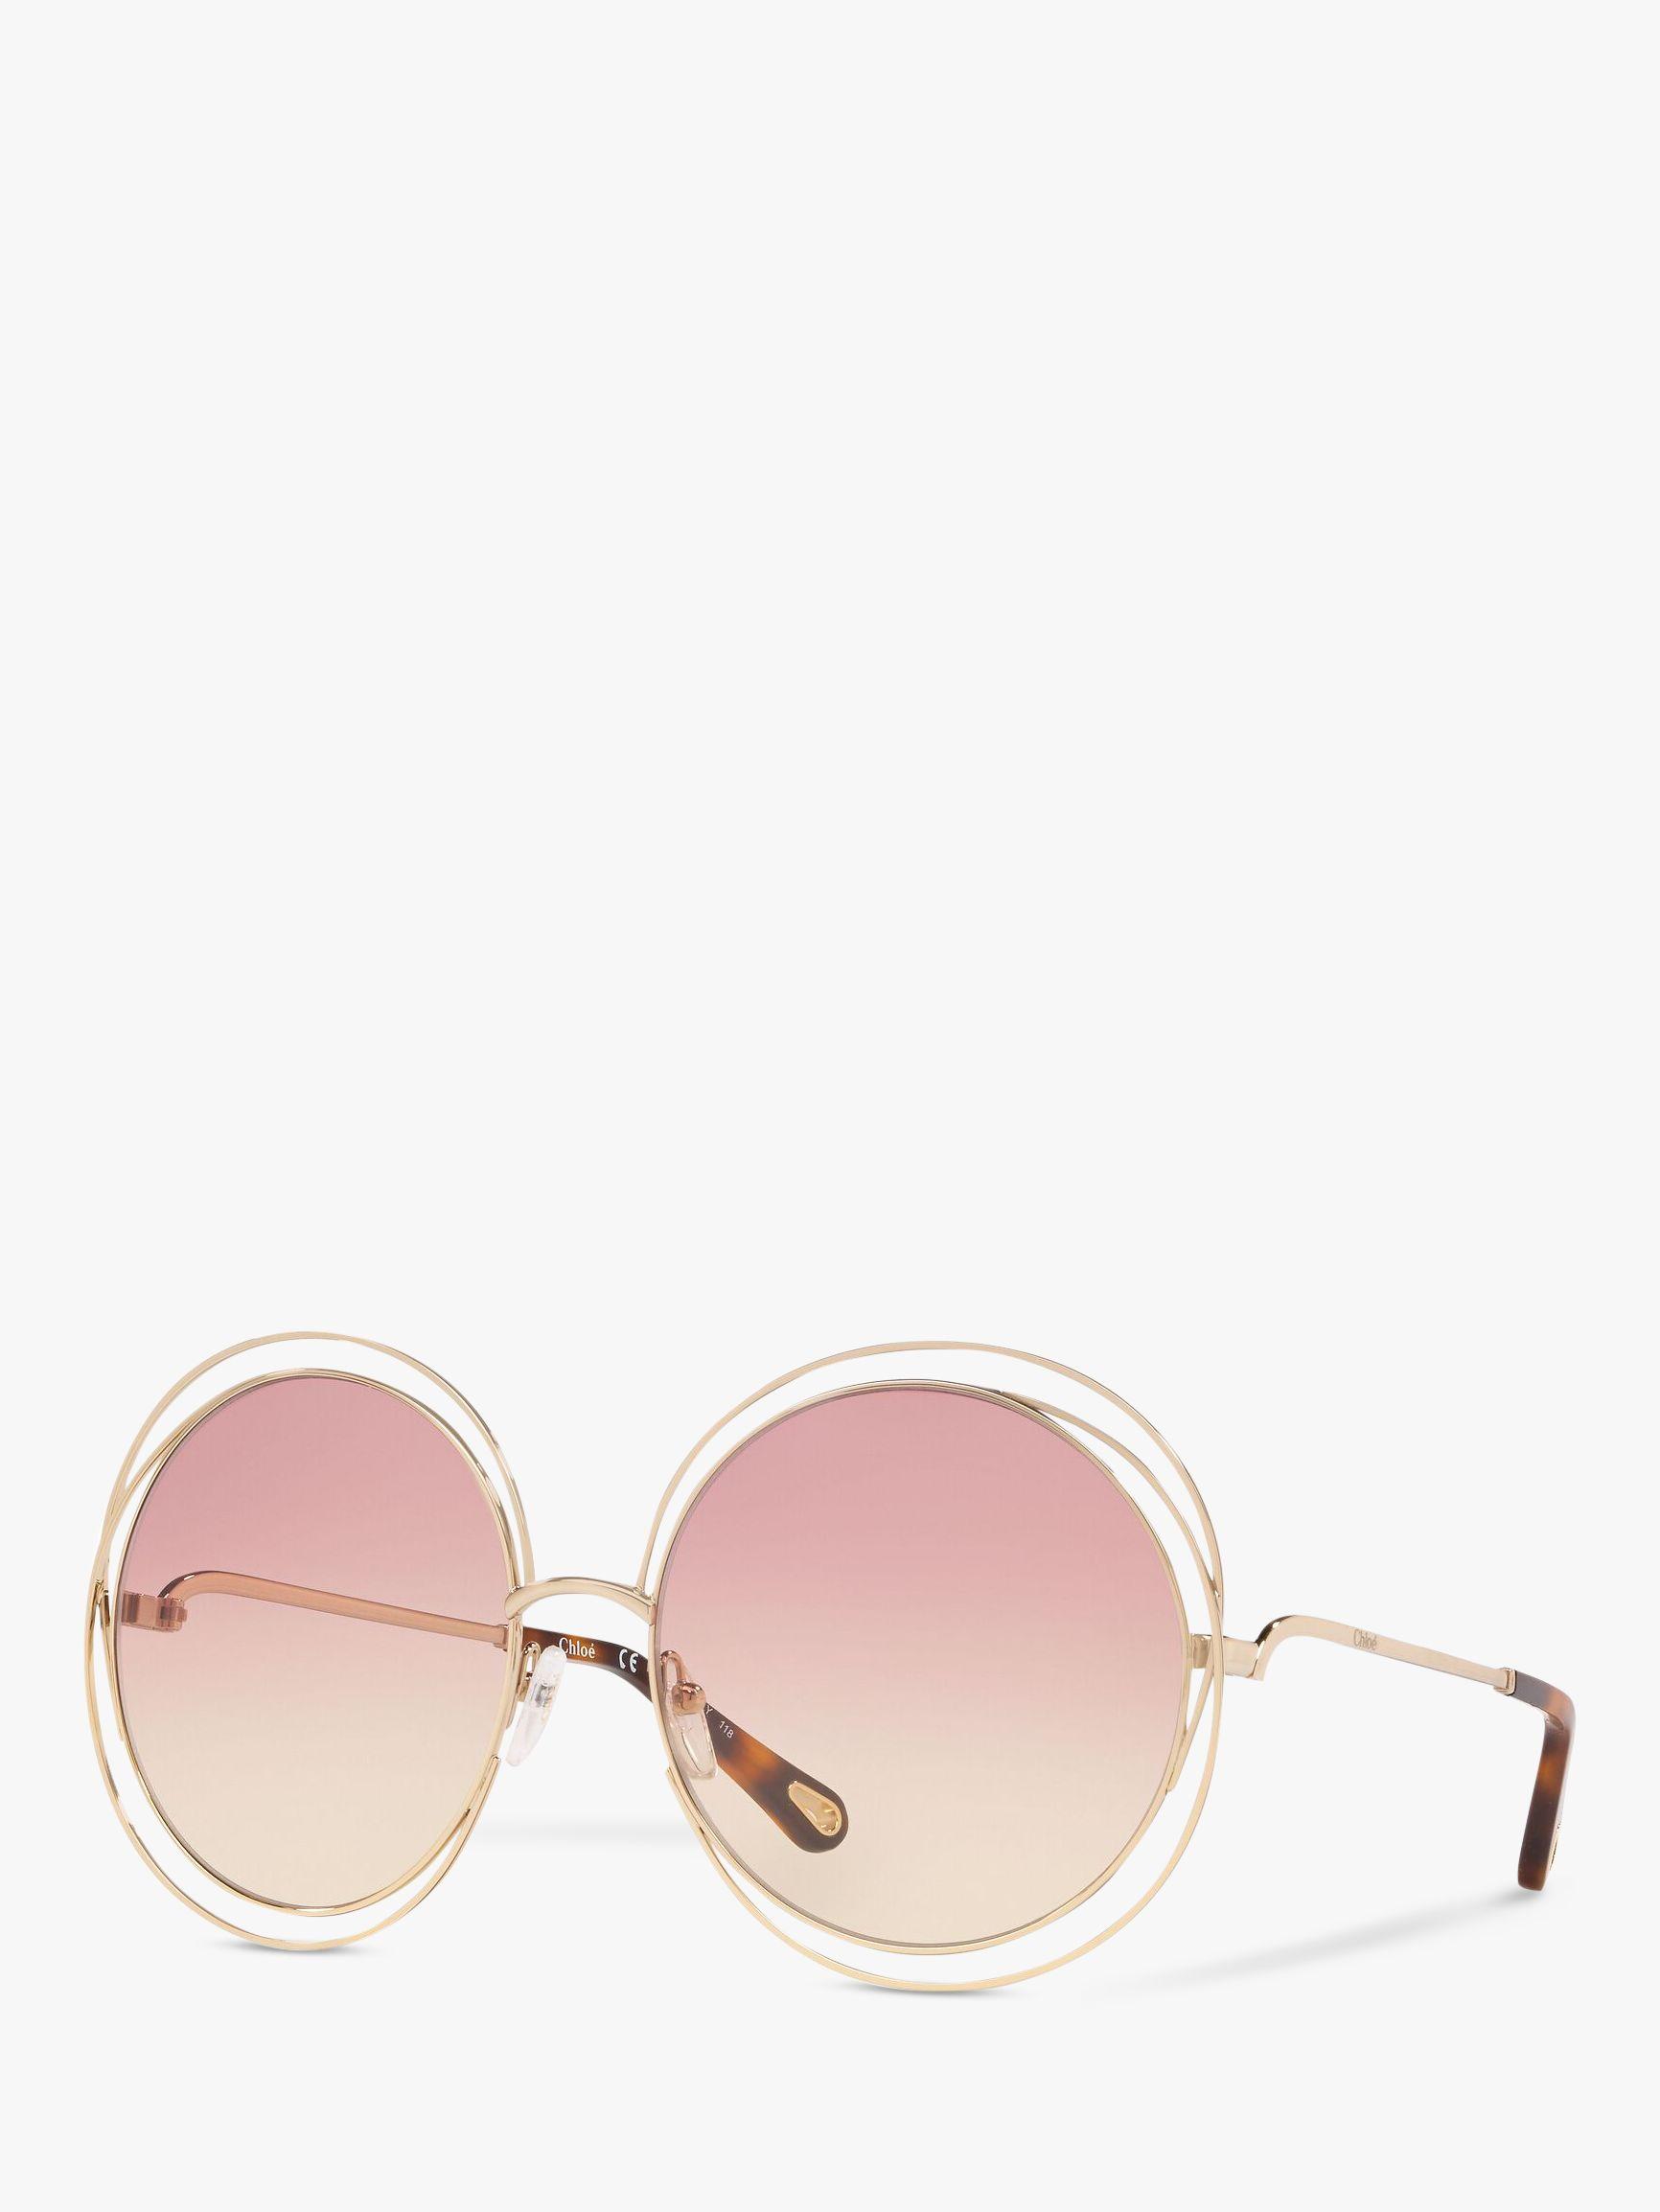 Chloe Chloé CE114SD Women's Double Rim Round Sunglasses, Gold/Pink